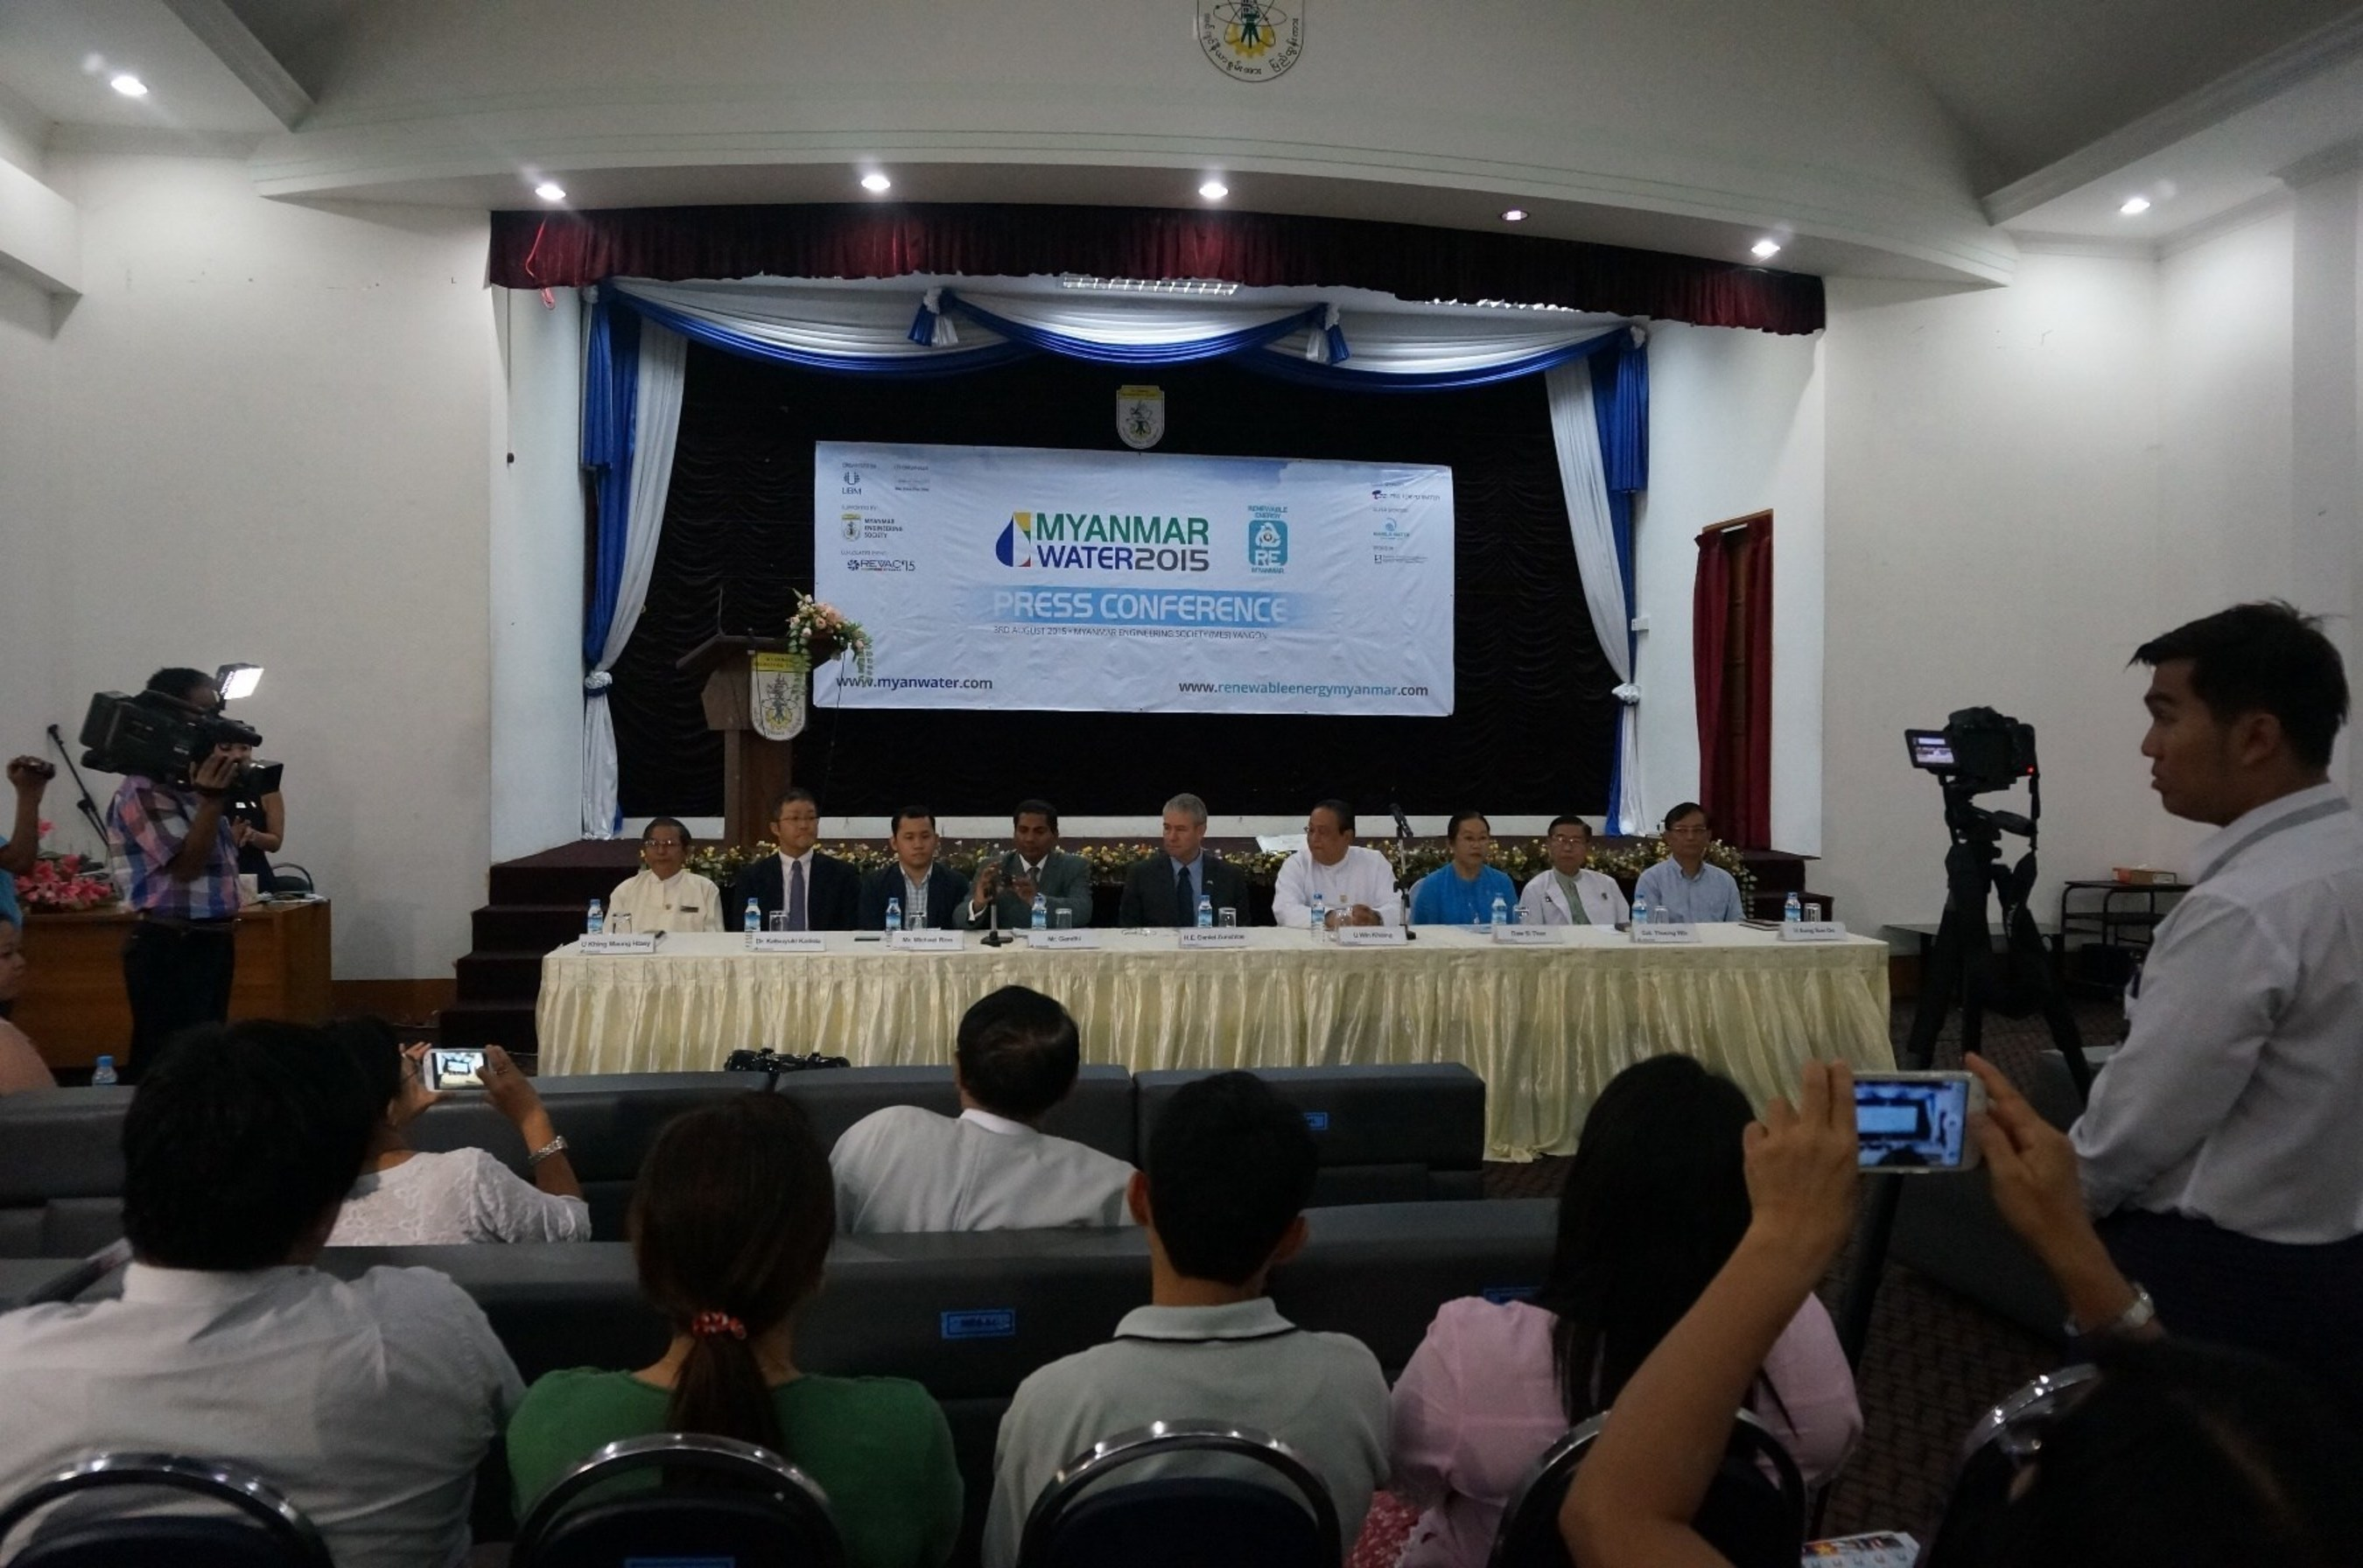 Press Conference of MyanmarWater 2015 and Renewable Energy Myanmar 2015